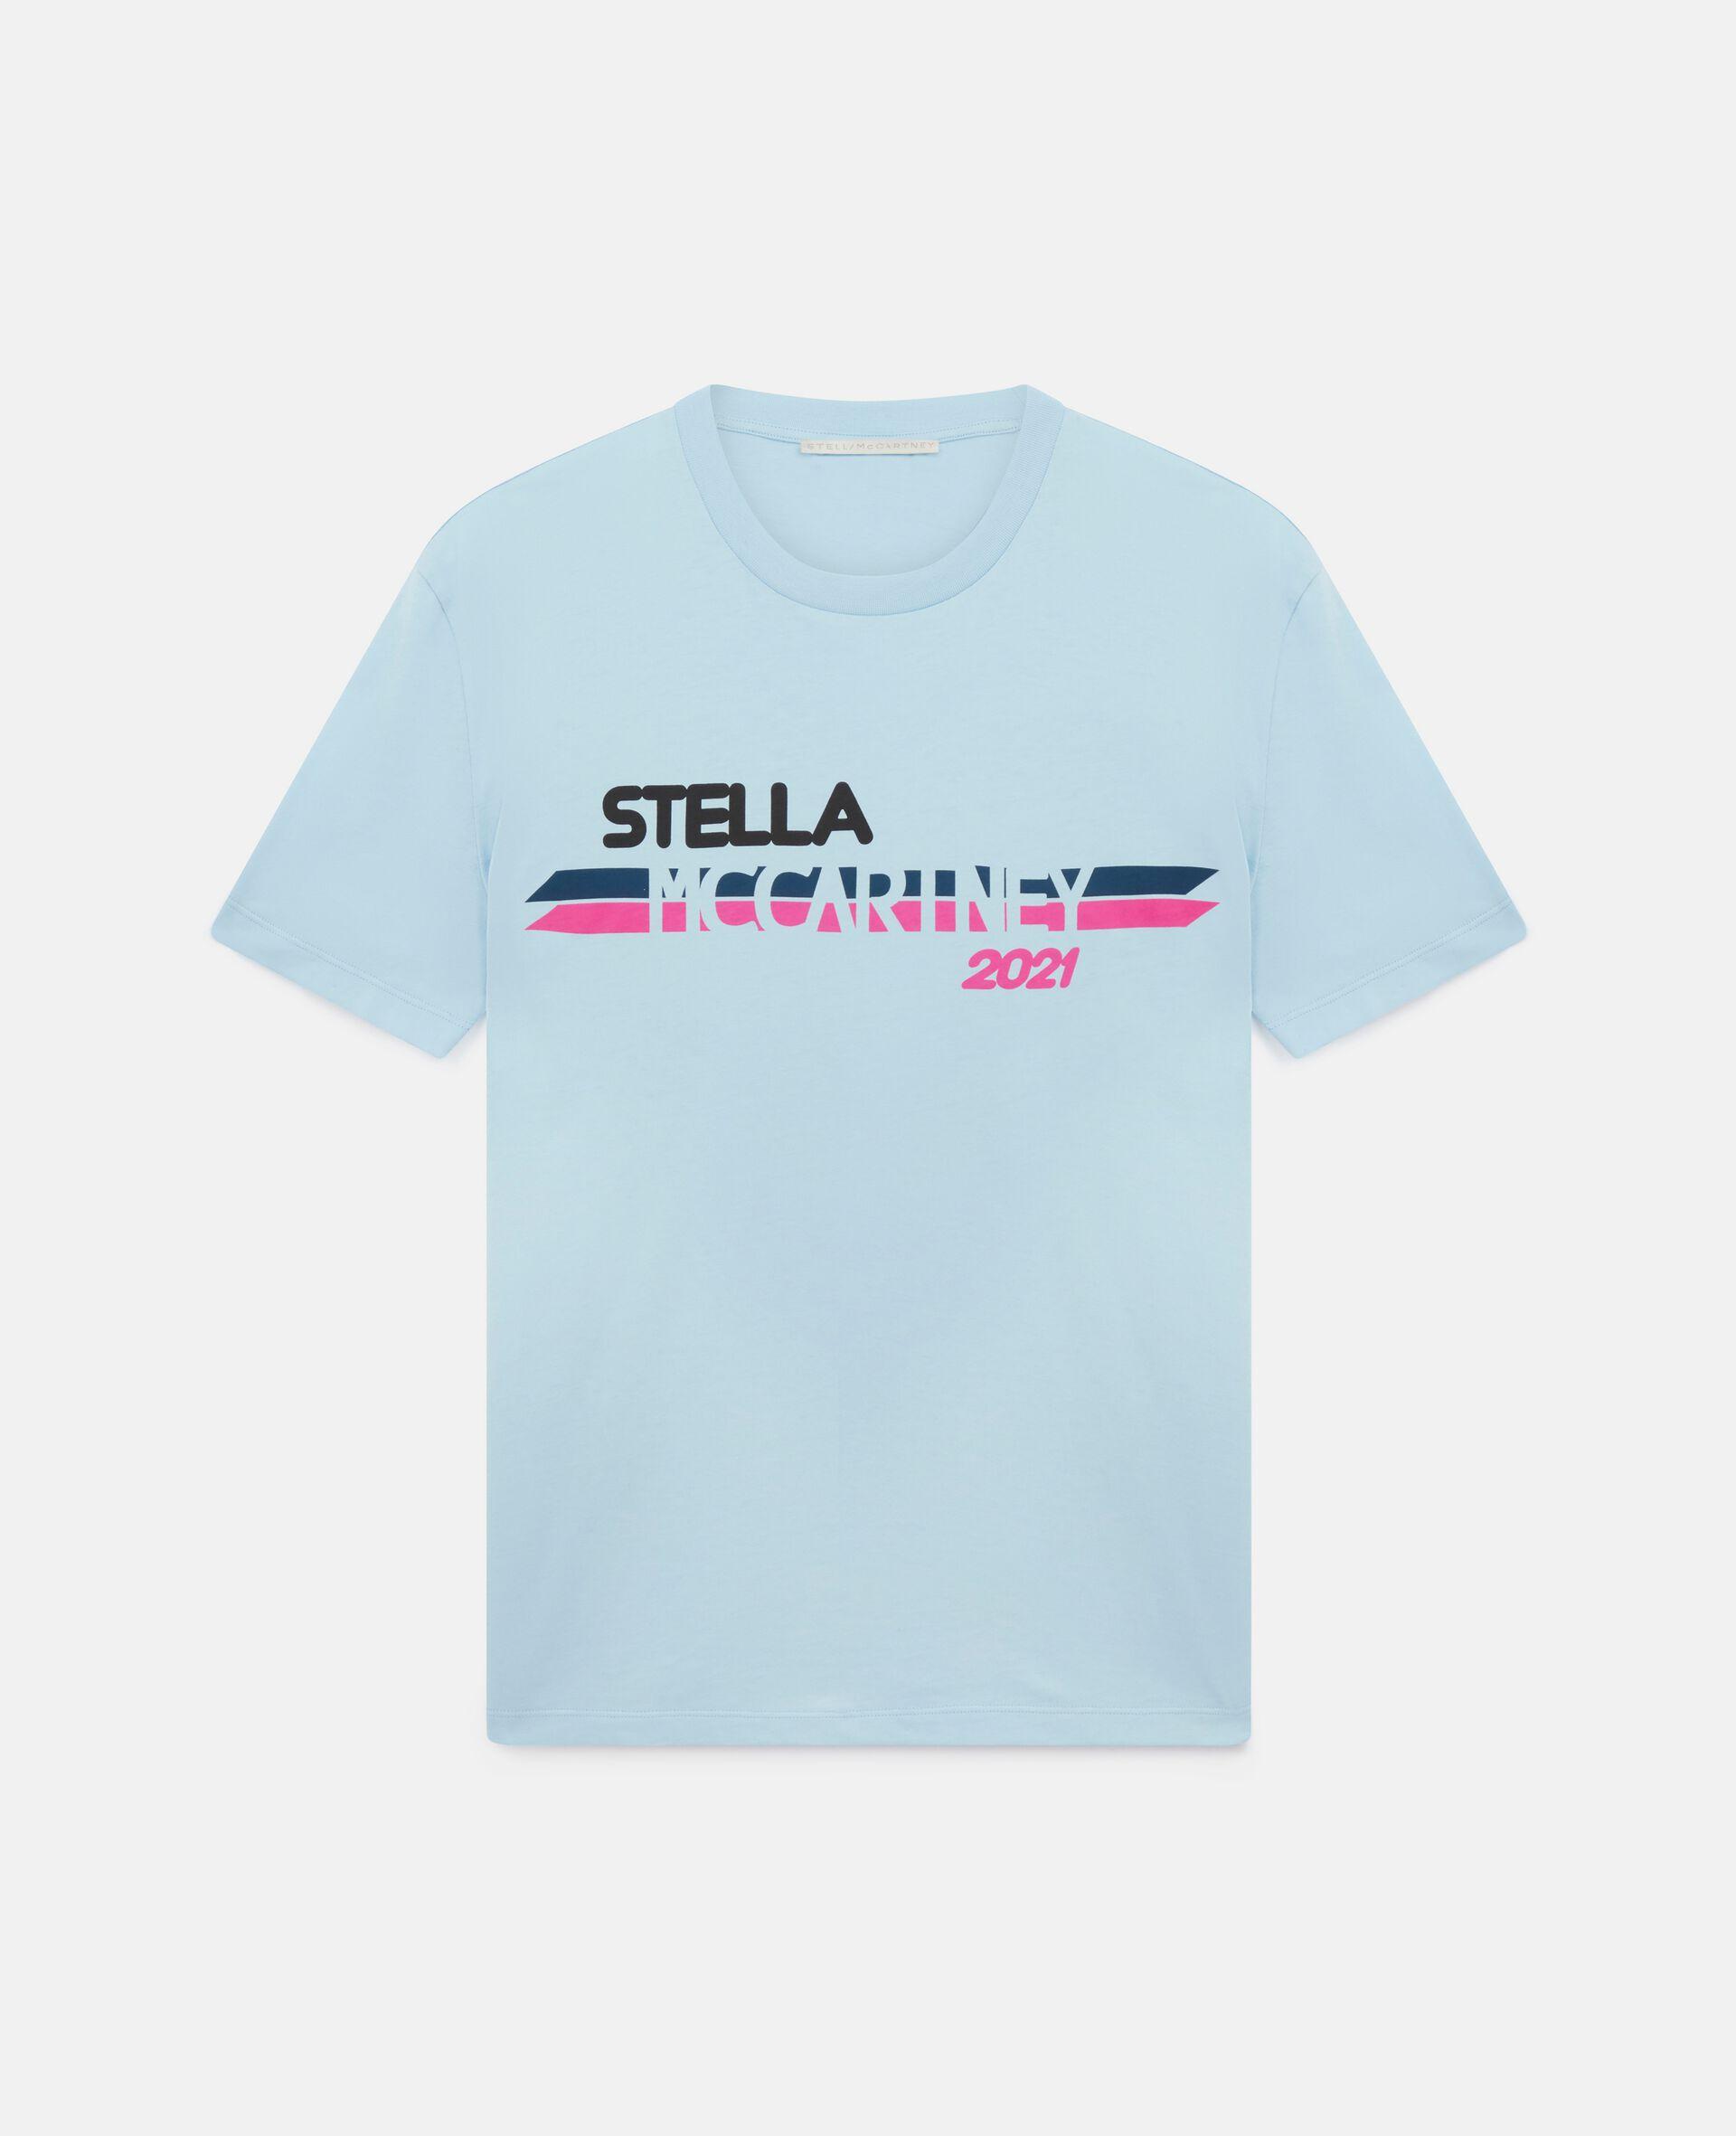 Stella McCartney 2021 徽标 T 恤-蓝色-large image number 0